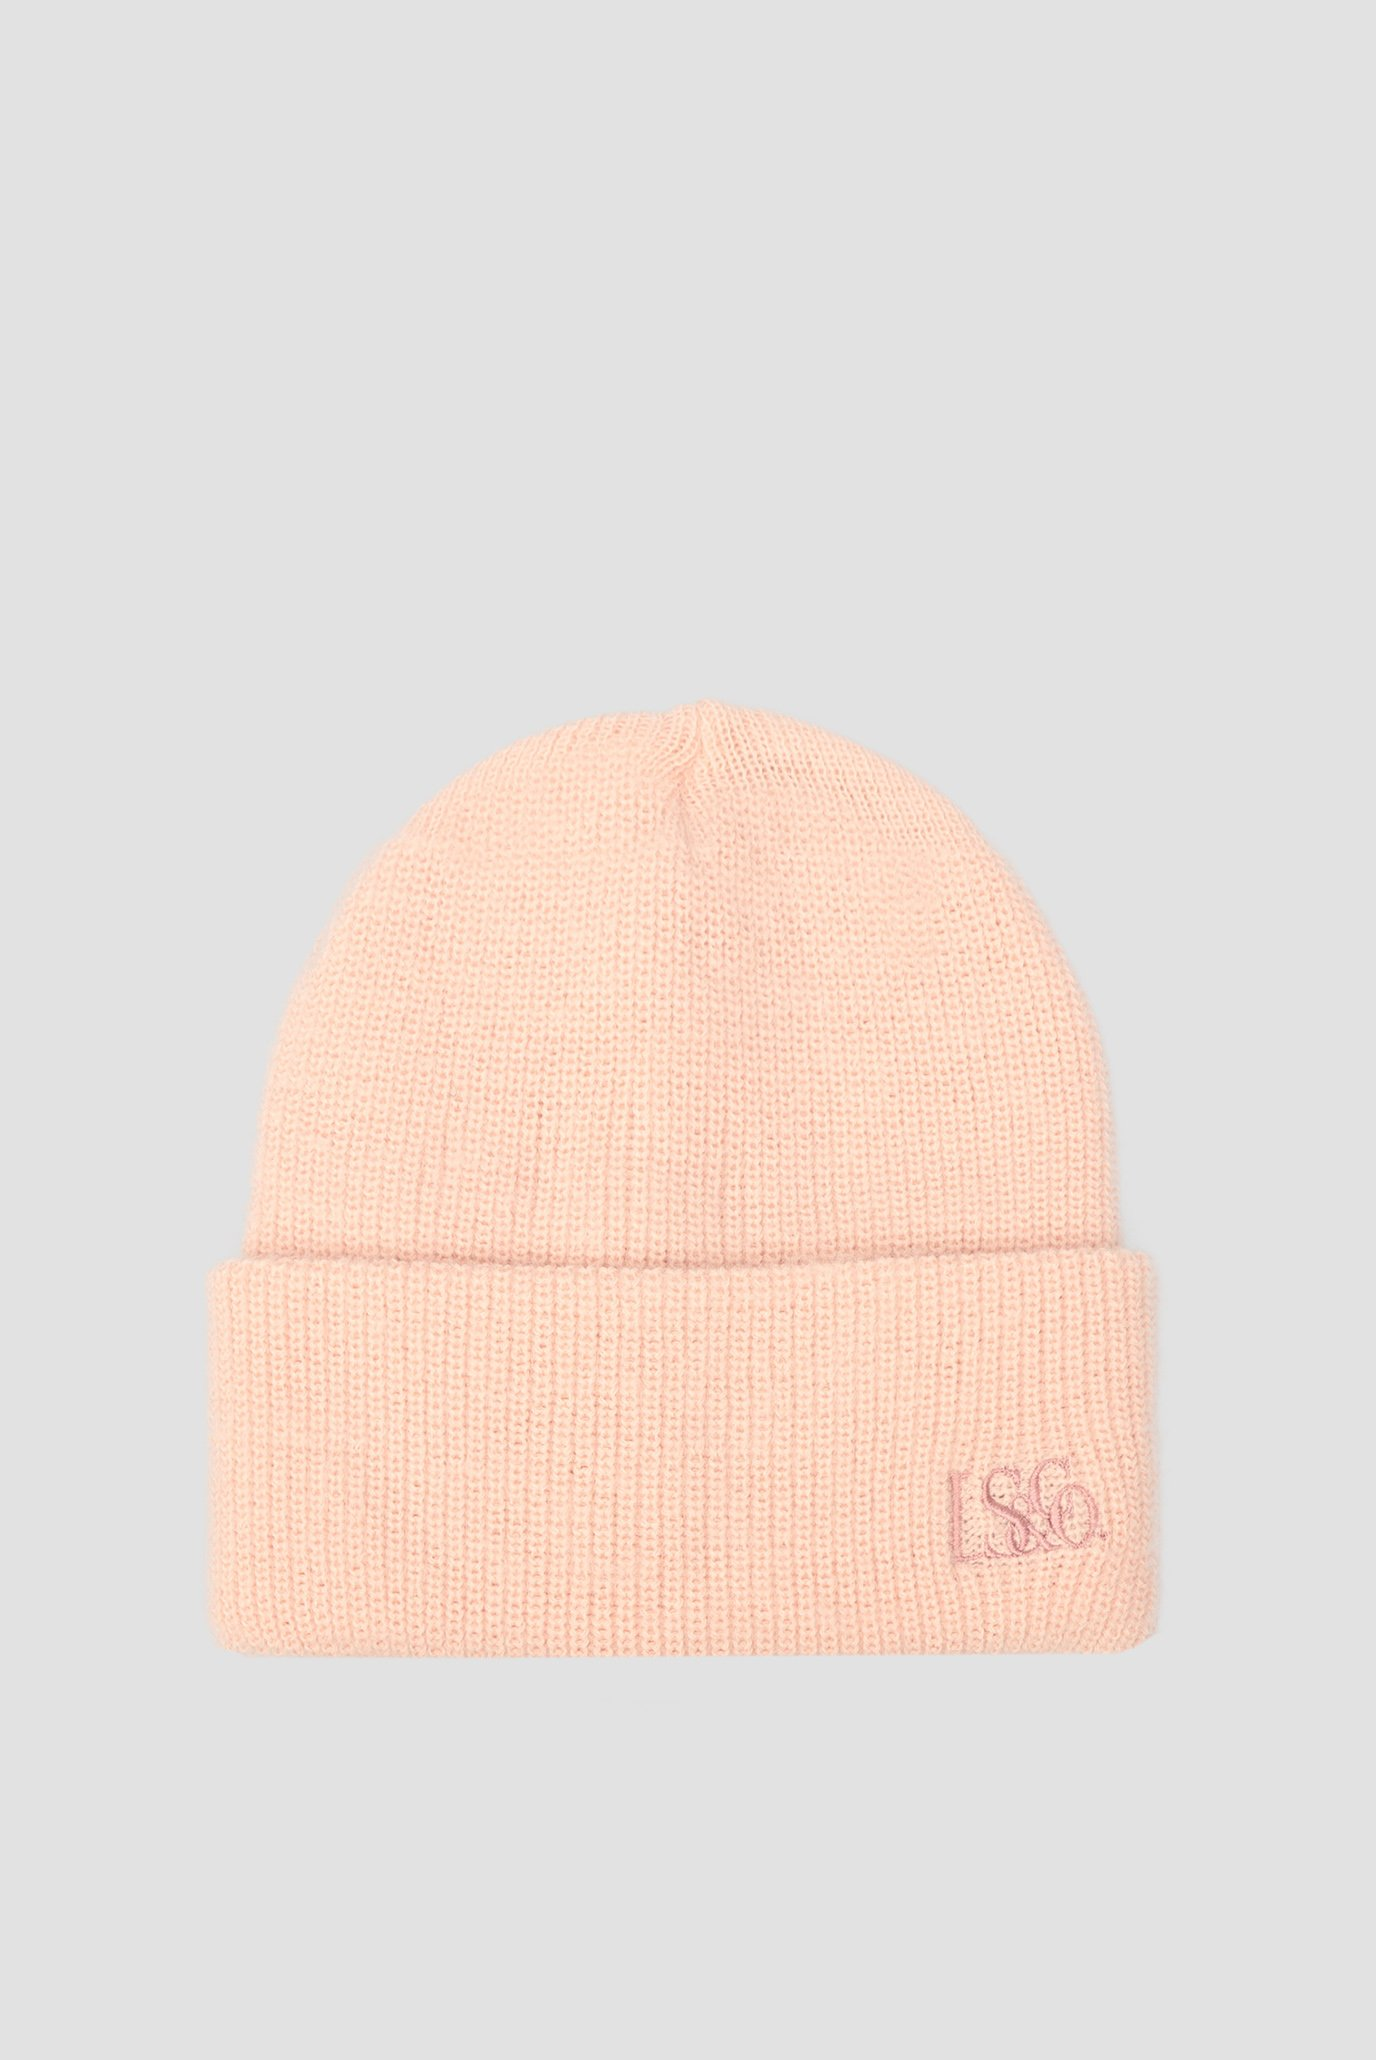 Жіноча рожева шапка 1